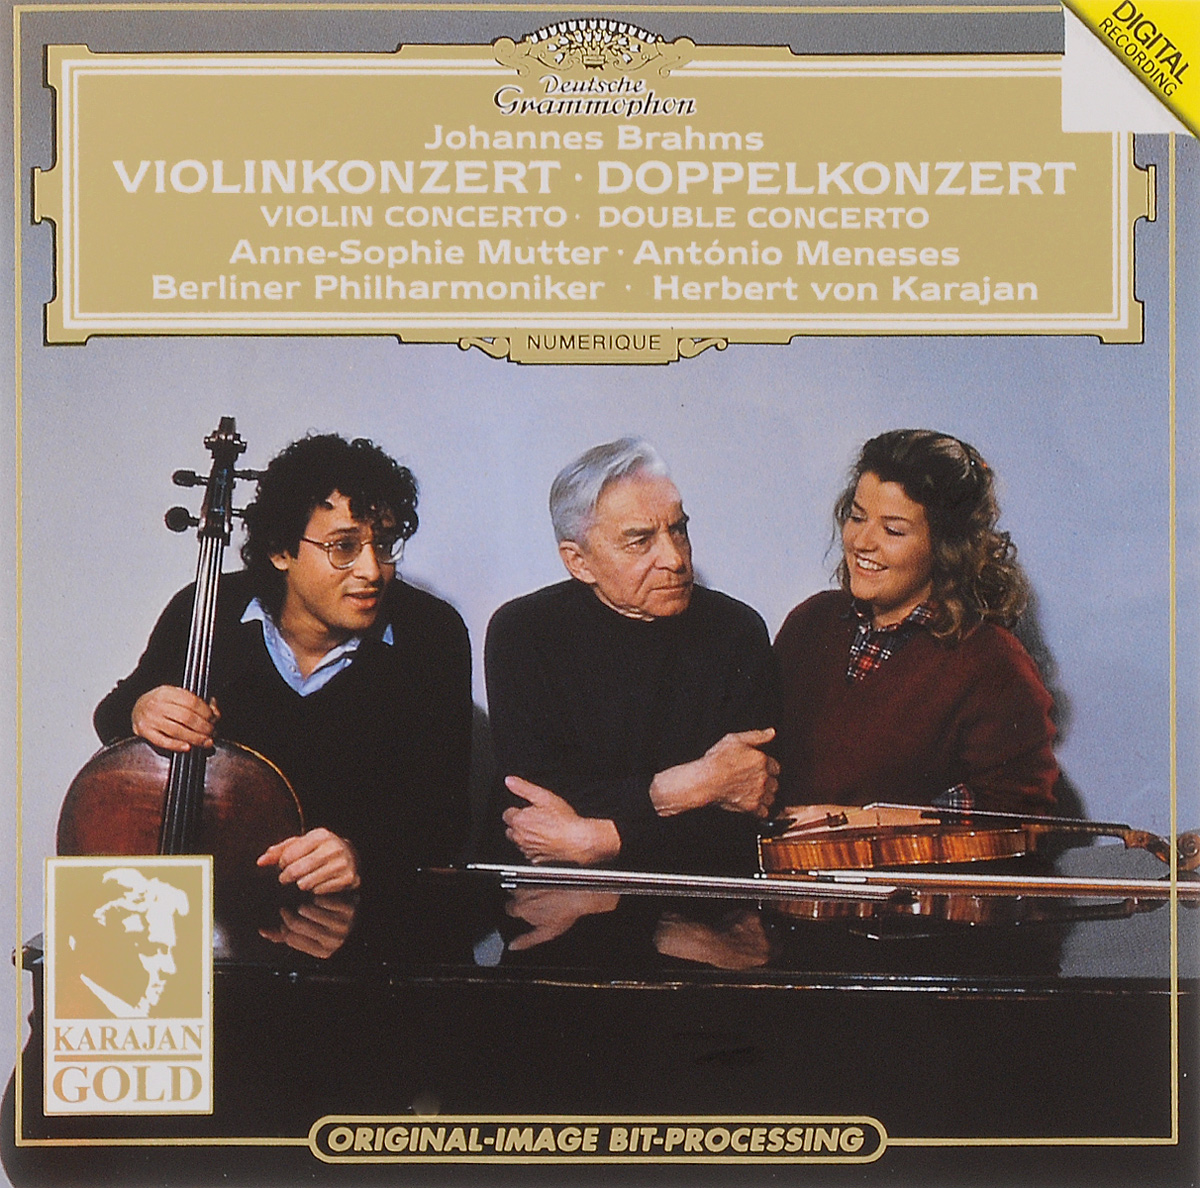 Анна-Софи Муттер,Антонио Менесес,Berliner Philharmoniker Herbert Von Karajan. Johannes Brahms. Violinkonzert / Doppelkonzert цена и фото